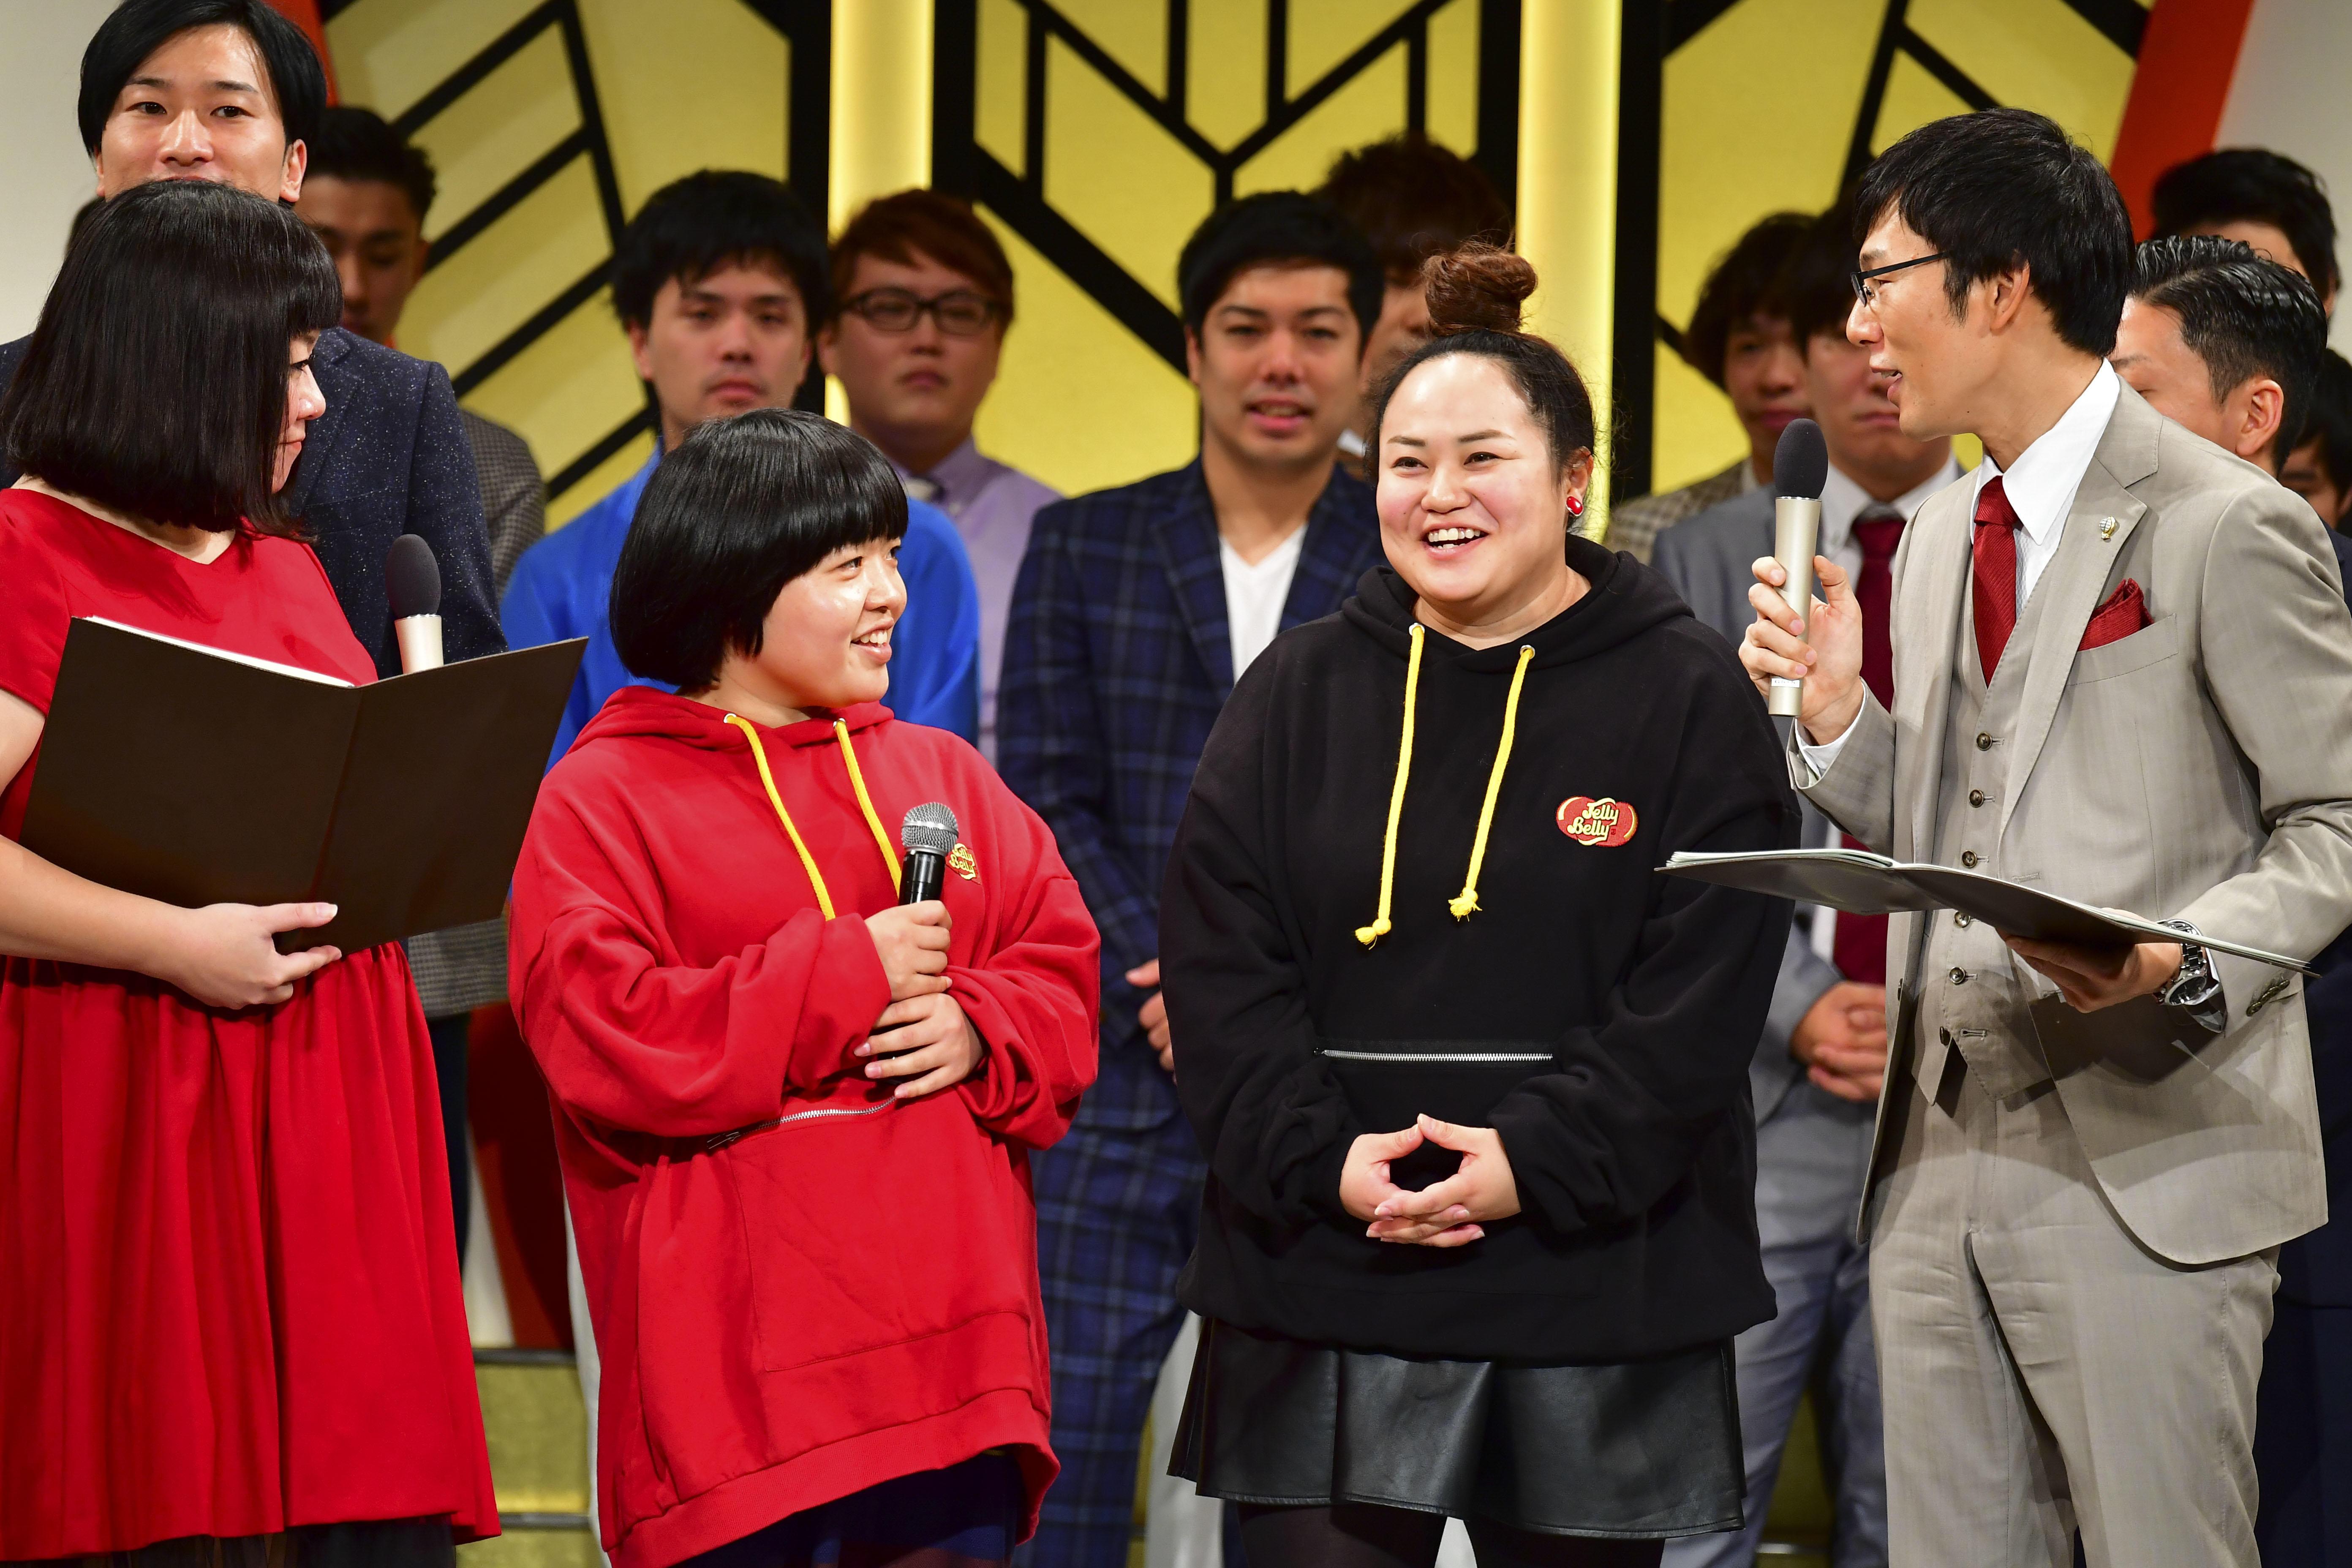 http://news.yoshimoto.co.jp/20171201191838-c08d1dd748c2fe5481d588860fecfb01f92193e2.jpg